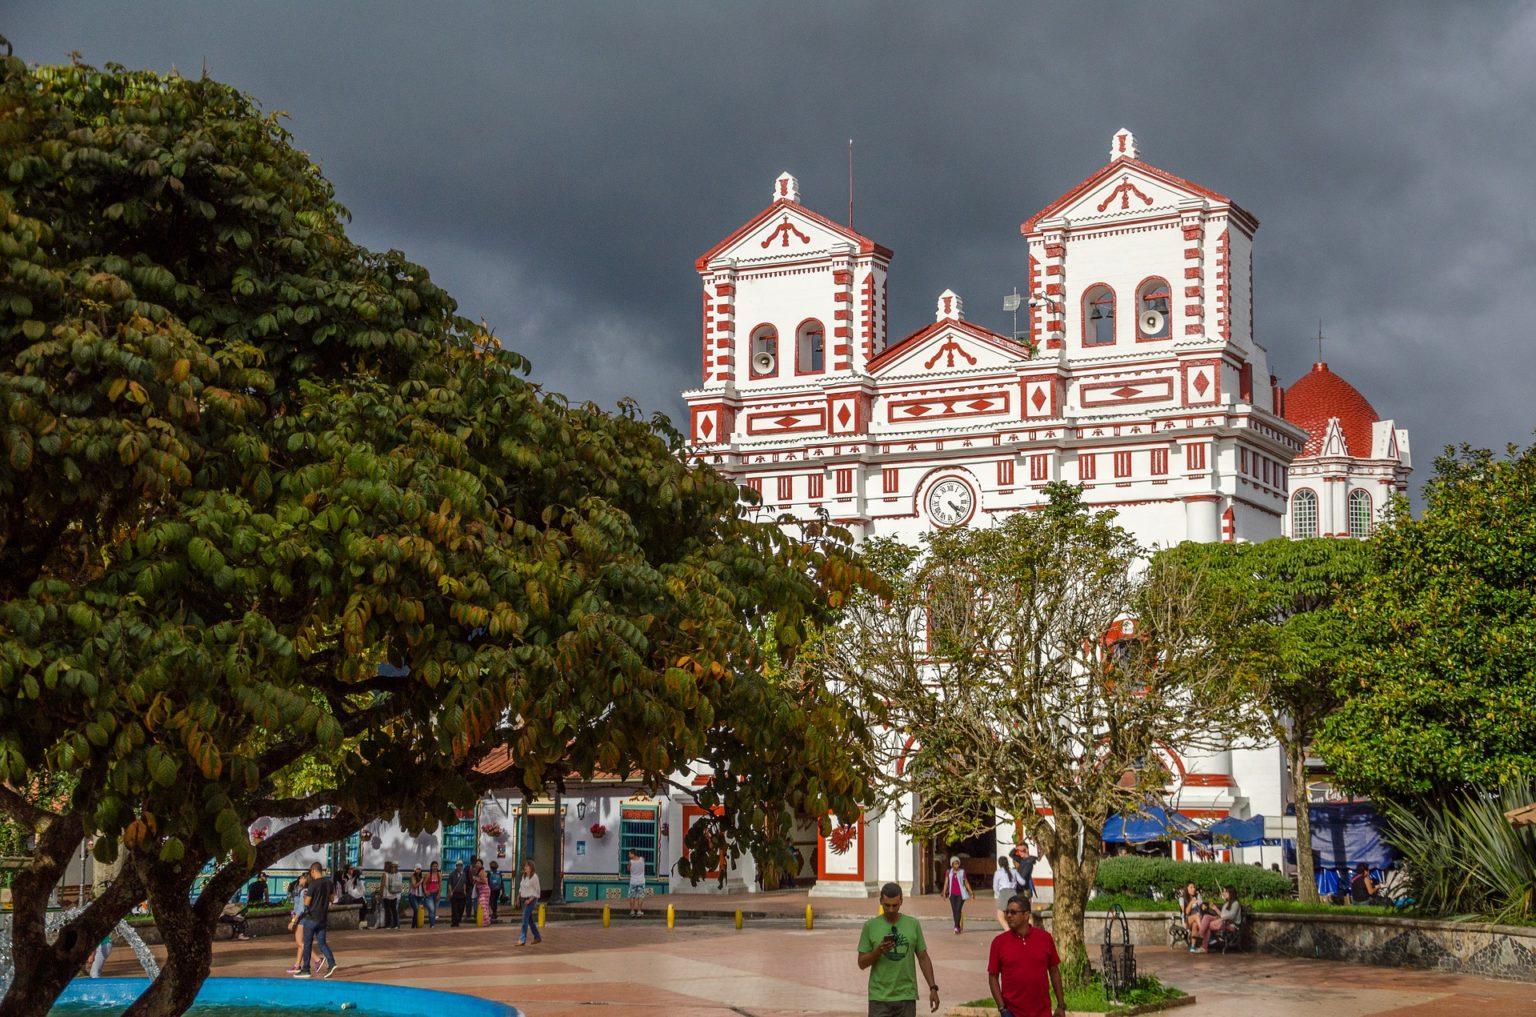 Walking tour in Pereira